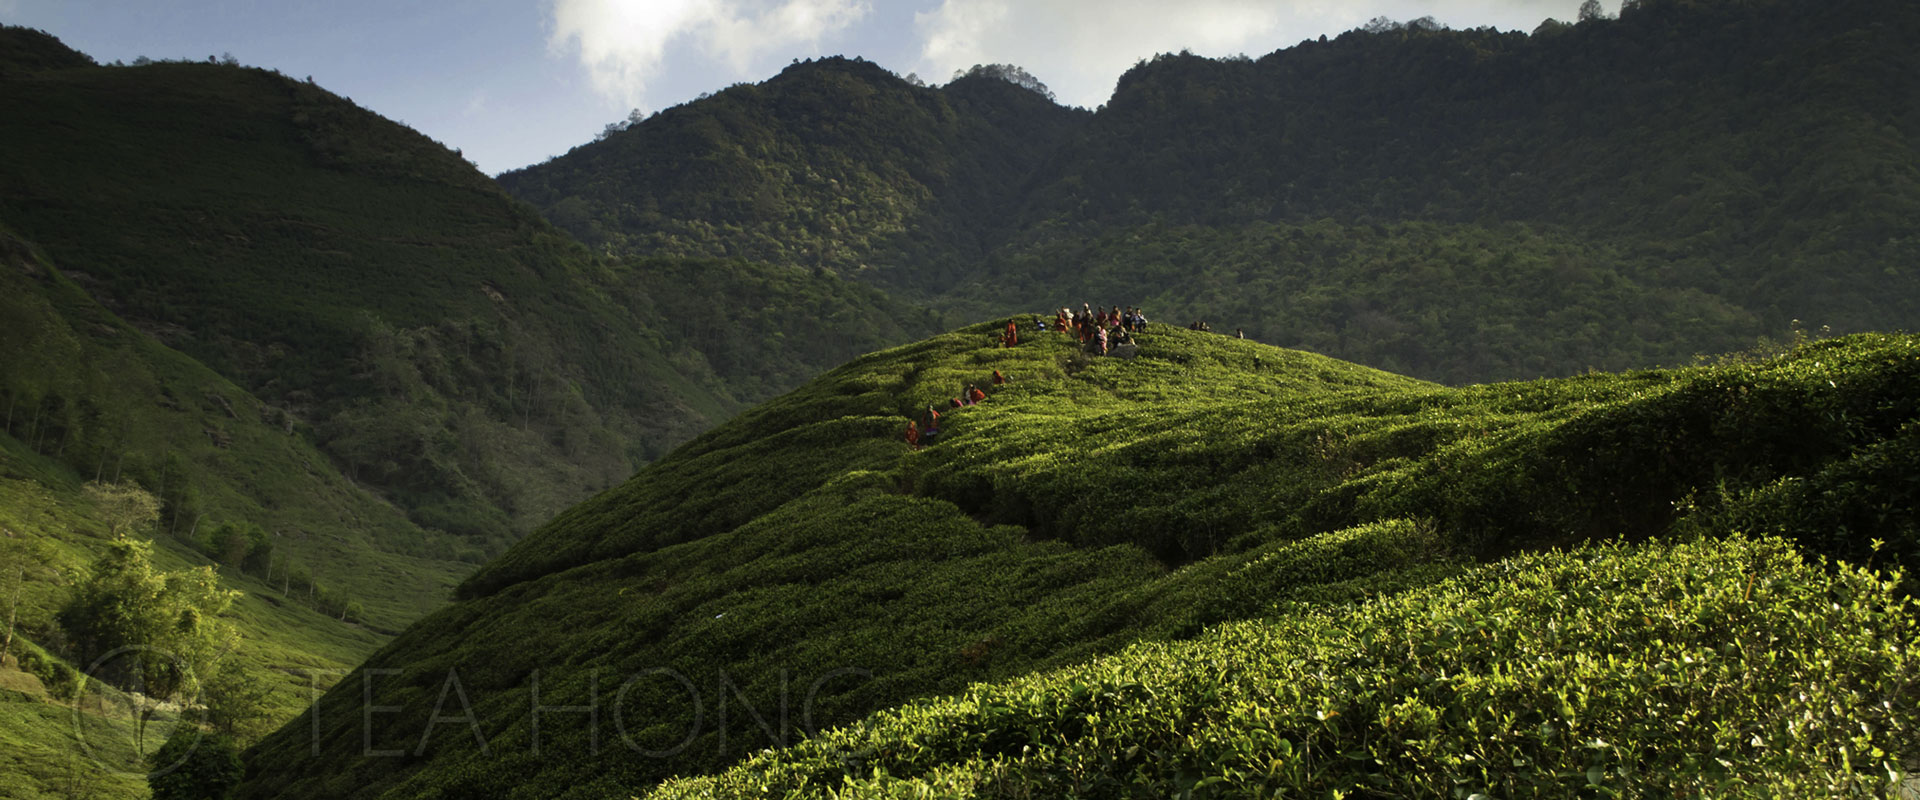 Tea Regions of TeaHomg.com: Nepal / Himalayas